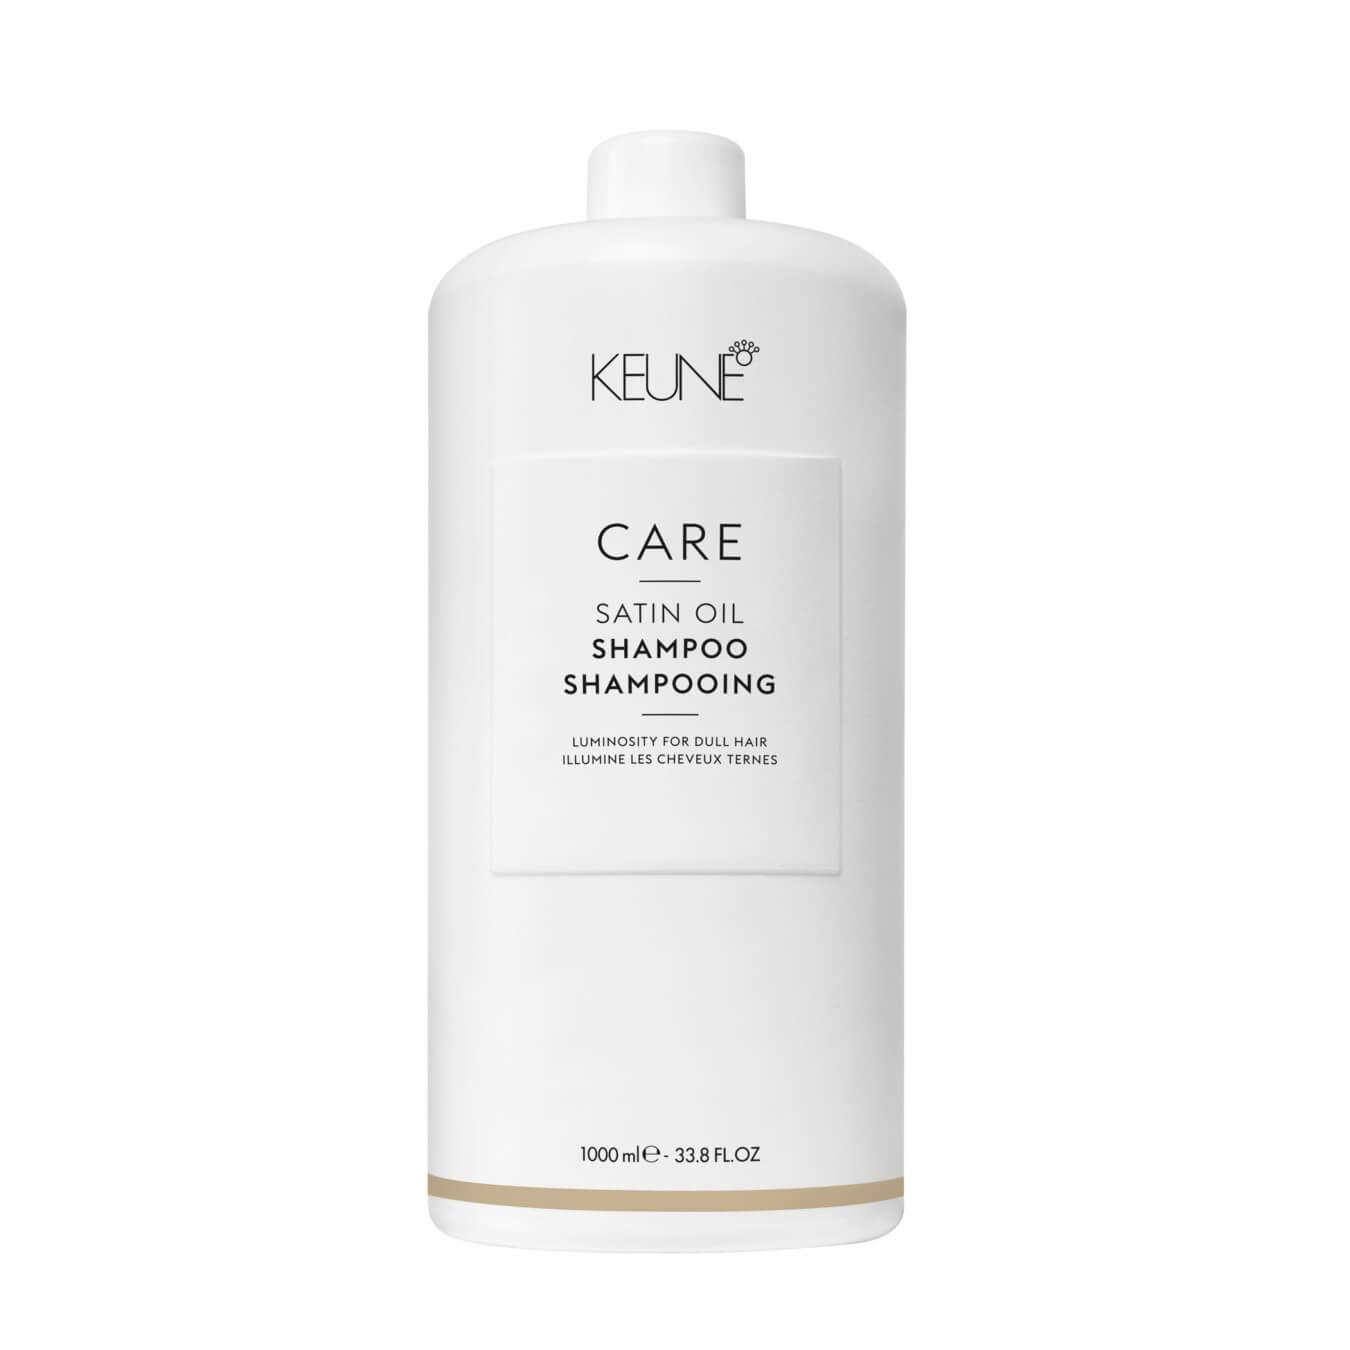 Kauf Keune Care Satin Oil Shampoo 1000ml